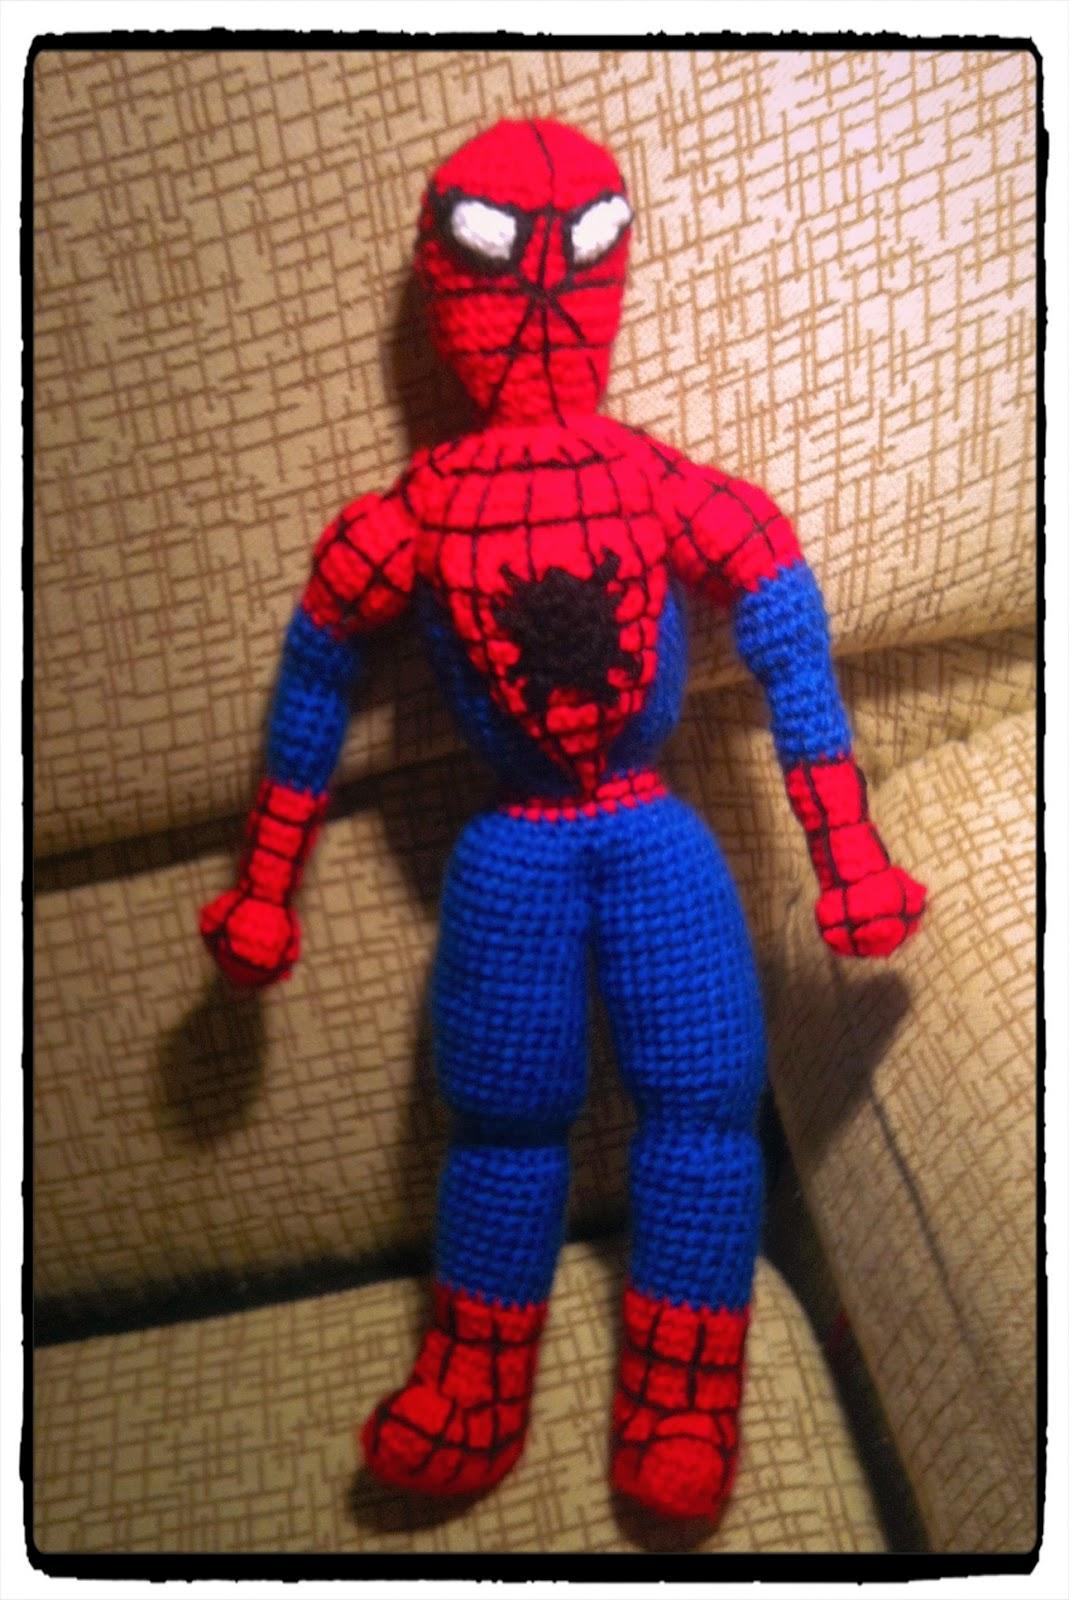 Amigurumi Spiderman Patron : Patron hombre arana crochet - Imagui